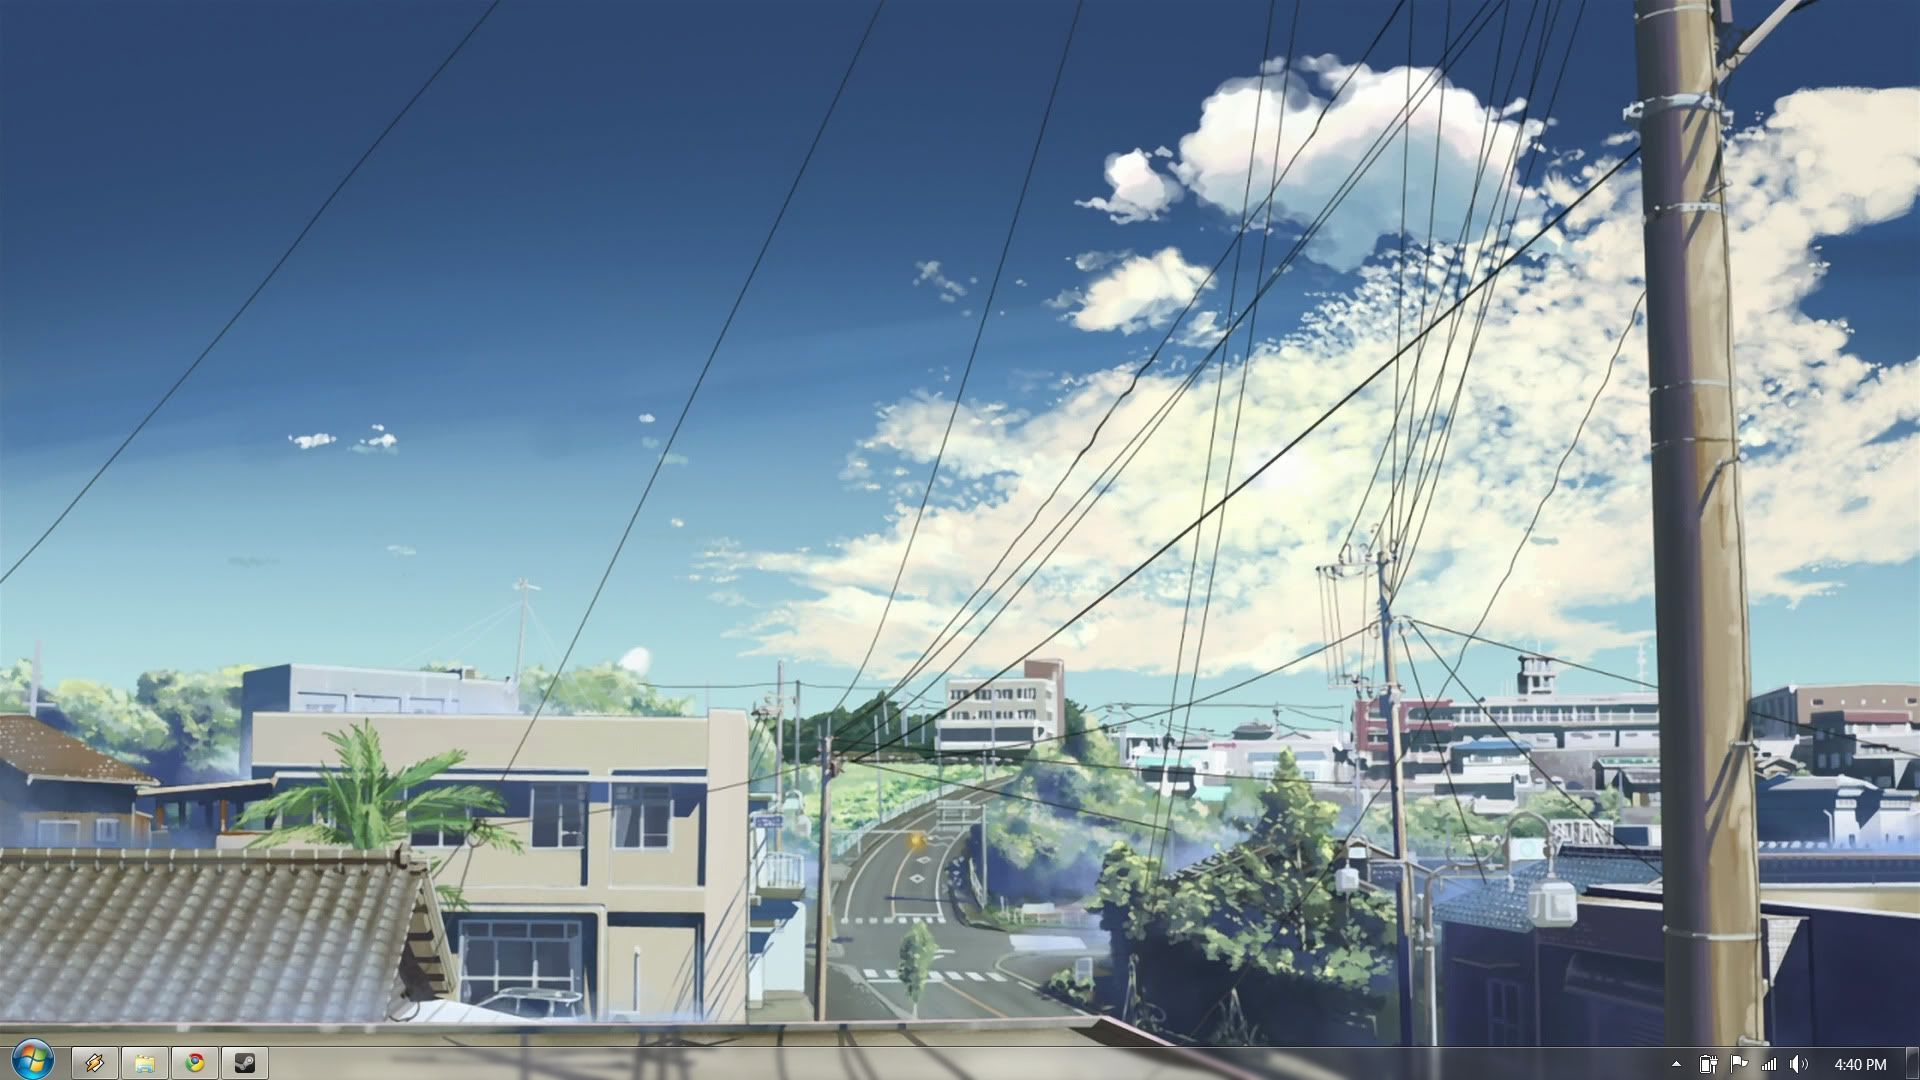 Aesthetic Anime Desktop Wallpapers Top Aesthetic Anime 1920x1080 59 Vaporwave Hd Wallpapers Backgroun Anime Background Anime Scenery Anime Wallpaper 1920x1080